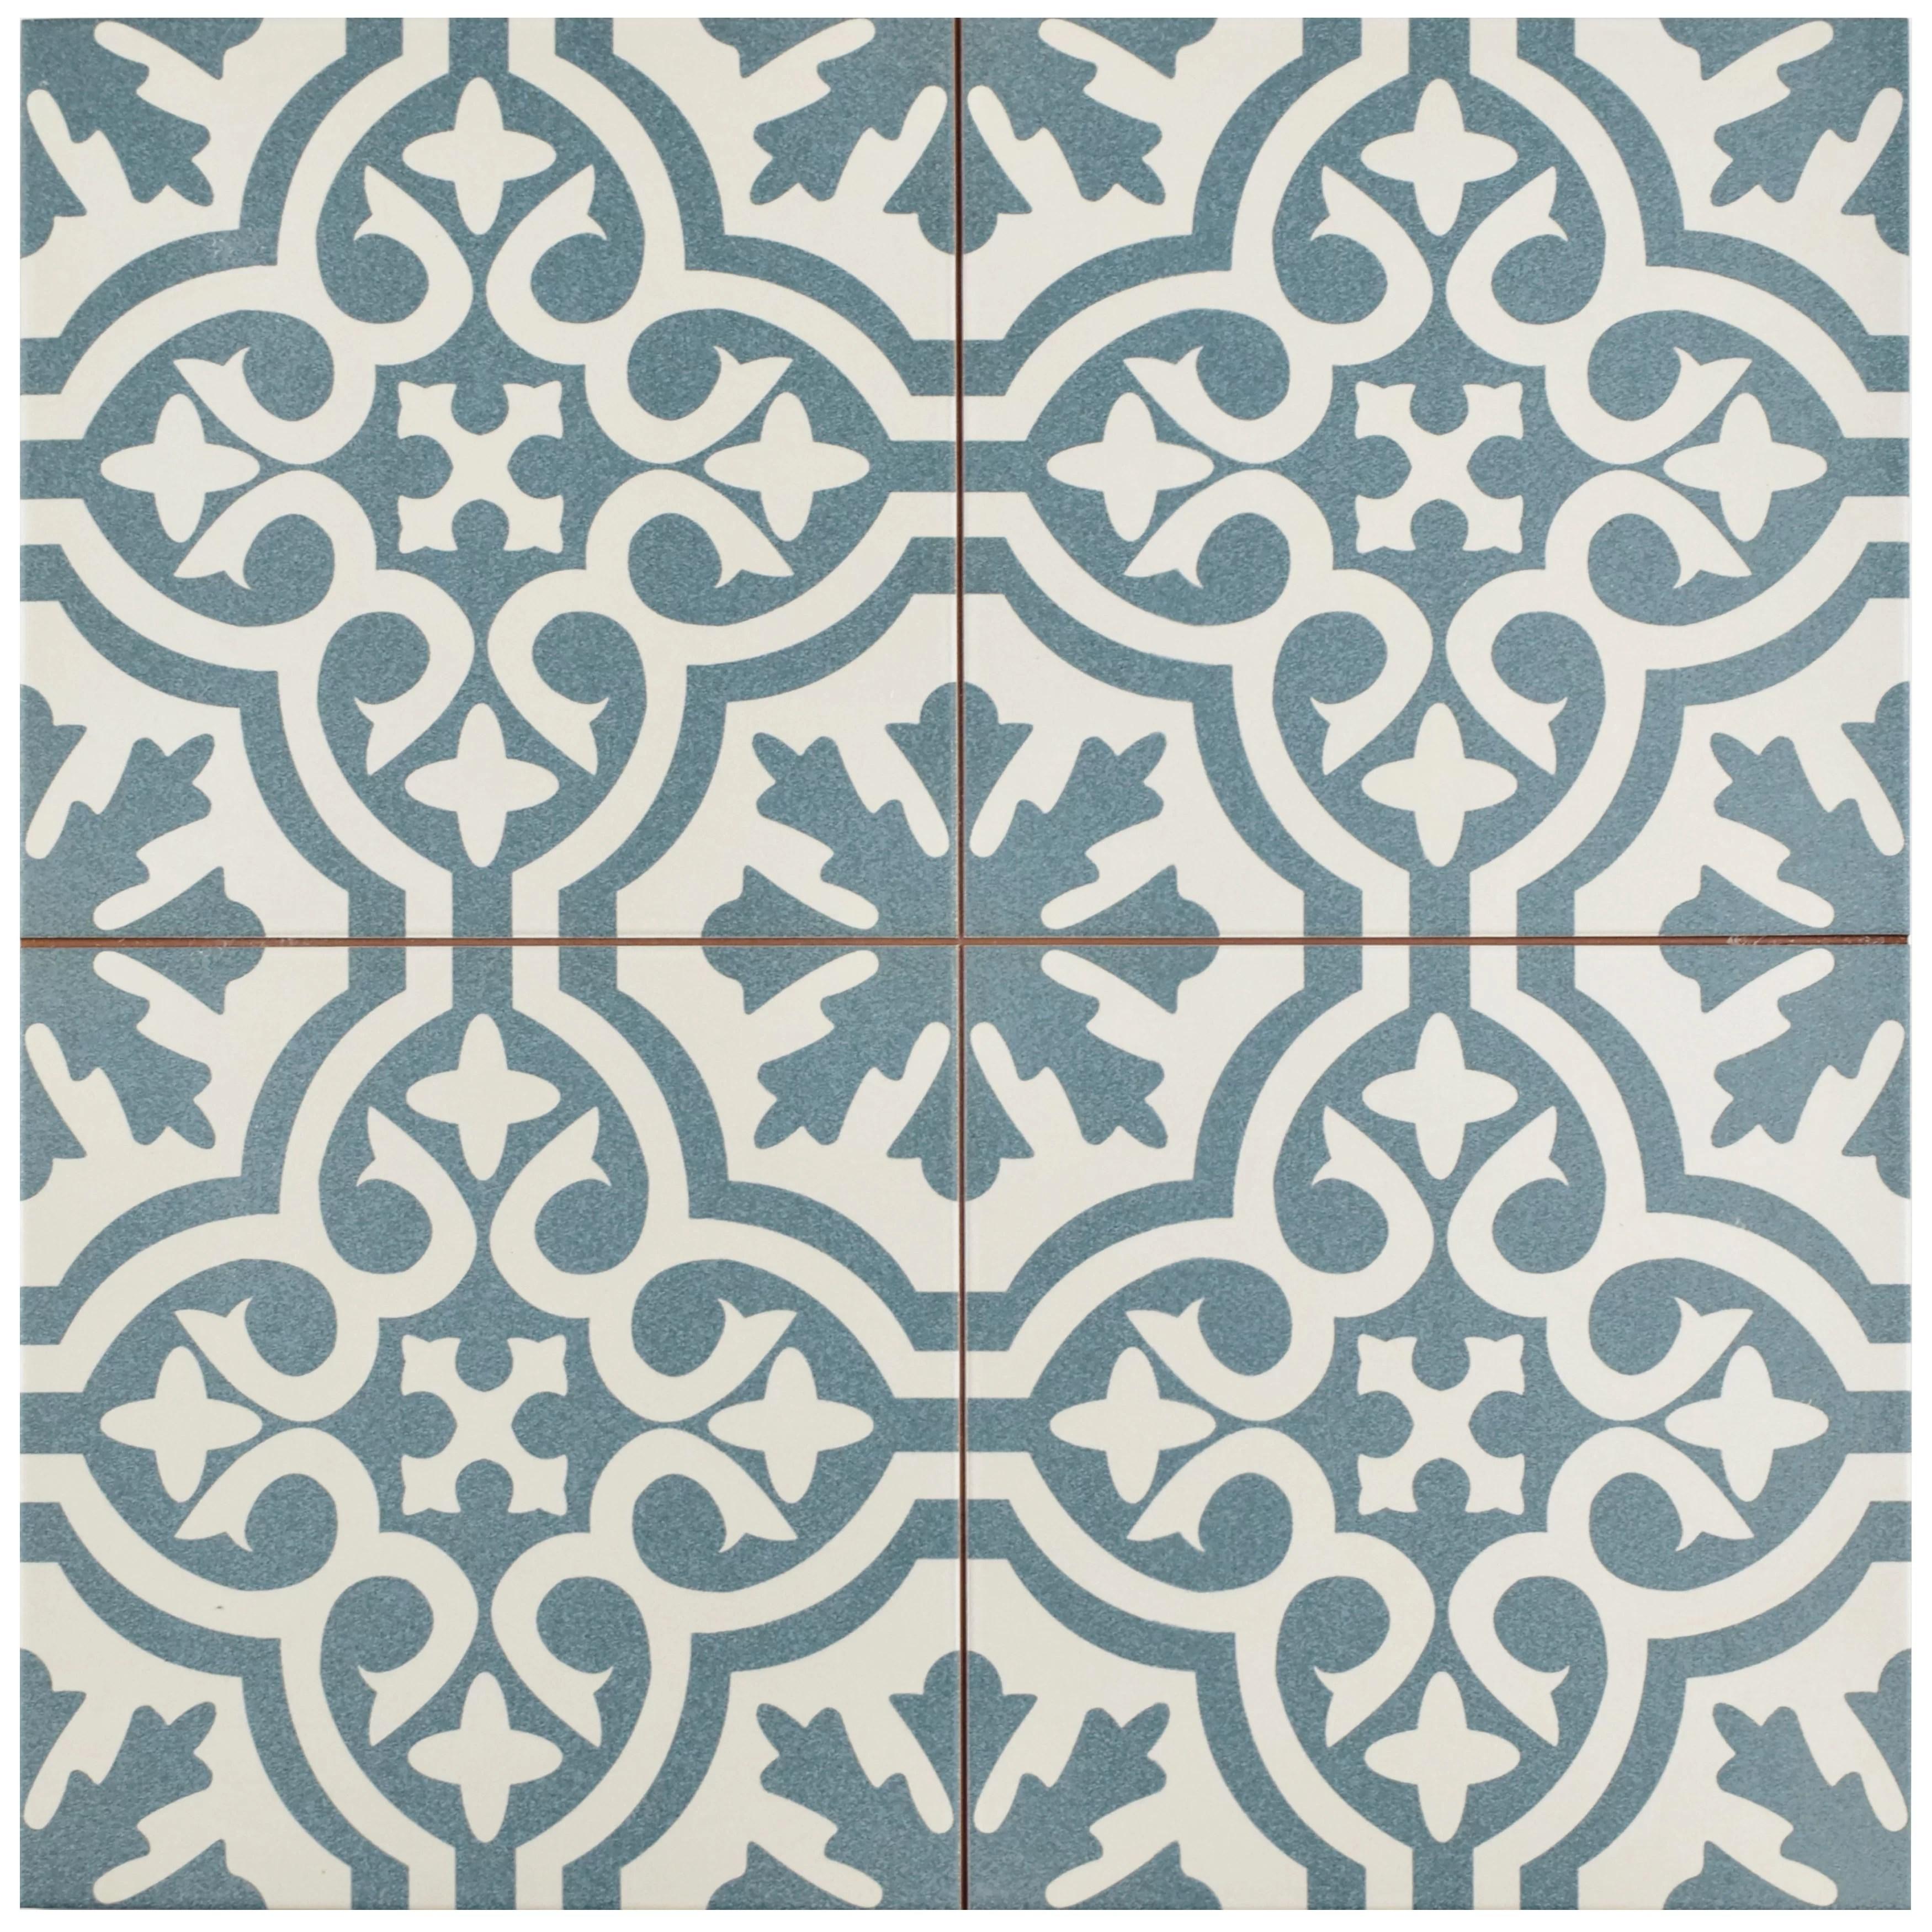 18 x 18 ceramic floor tiles wall